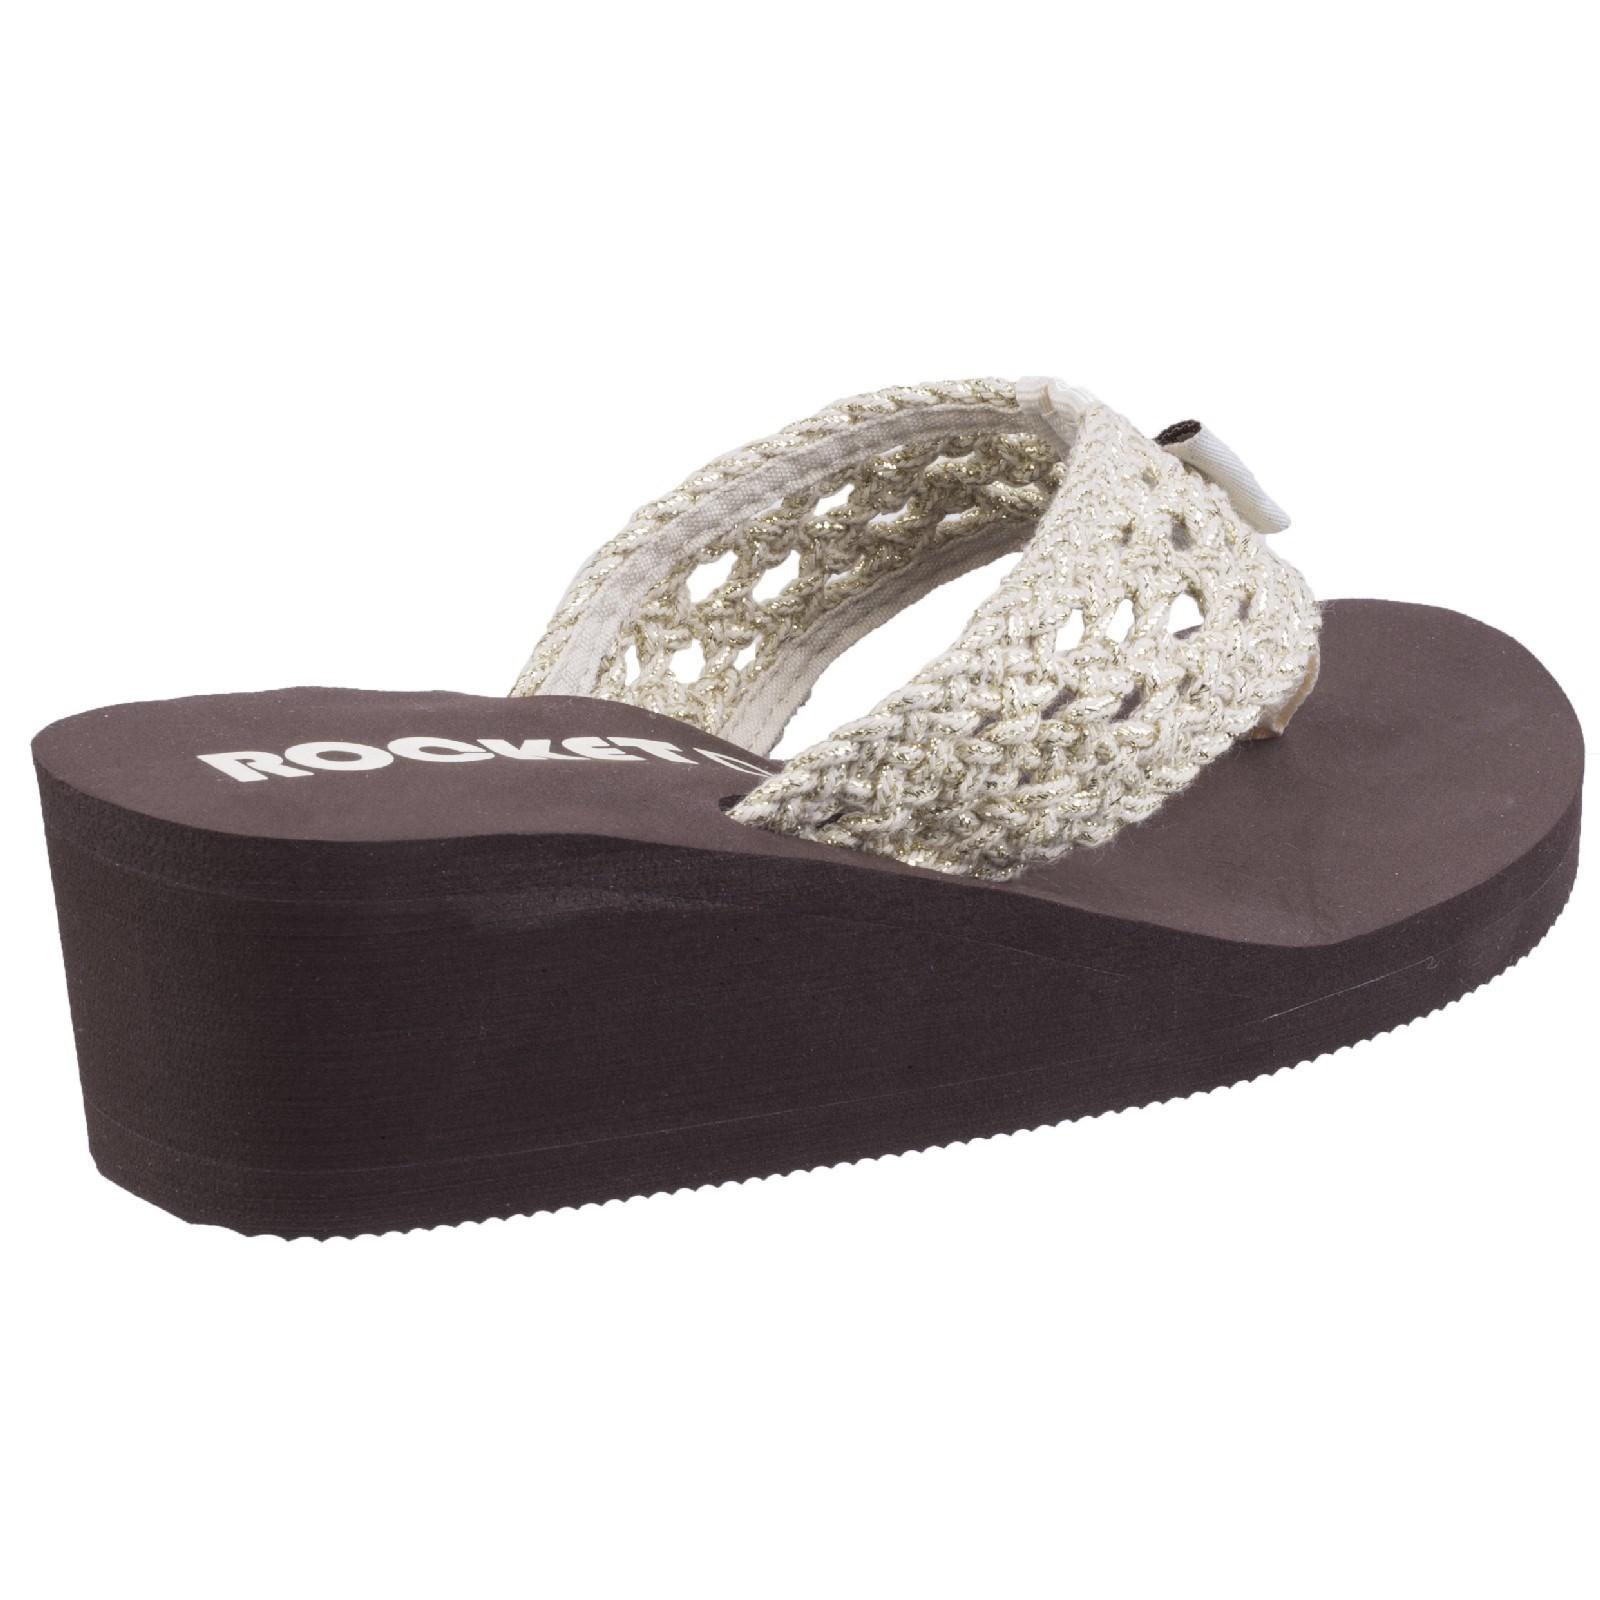 rocket dog aviara stapleton damen zehentrenner sommerschuhe flip flops sandalen ebay. Black Bedroom Furniture Sets. Home Design Ideas